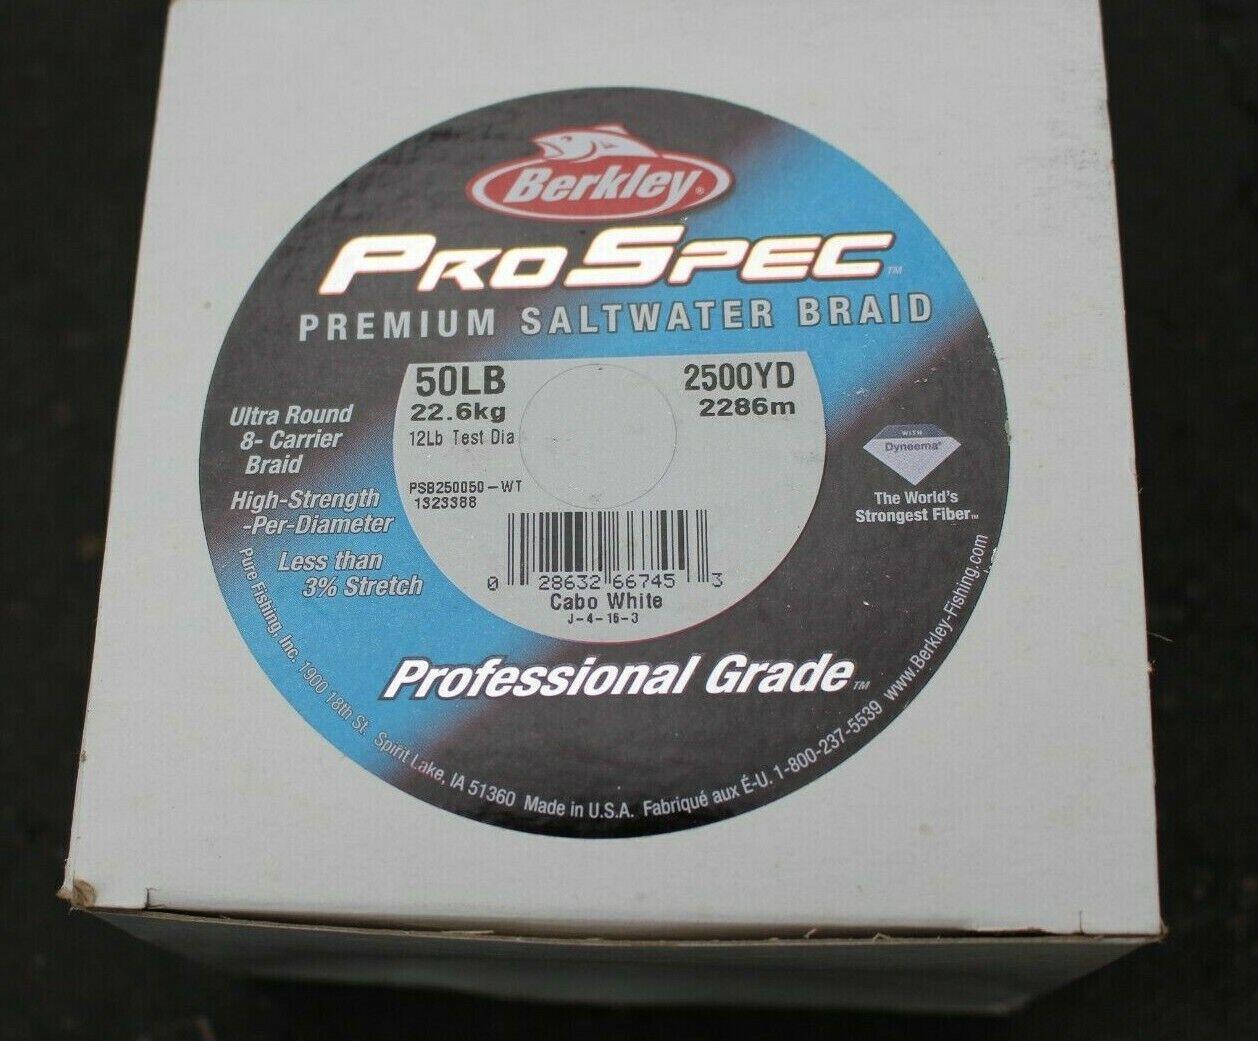 BERKLEY PROSPEC PREMIUM SALTWATER BRAID 50LB 2500YD PROFESSIONAL GRADE PRO SPEC